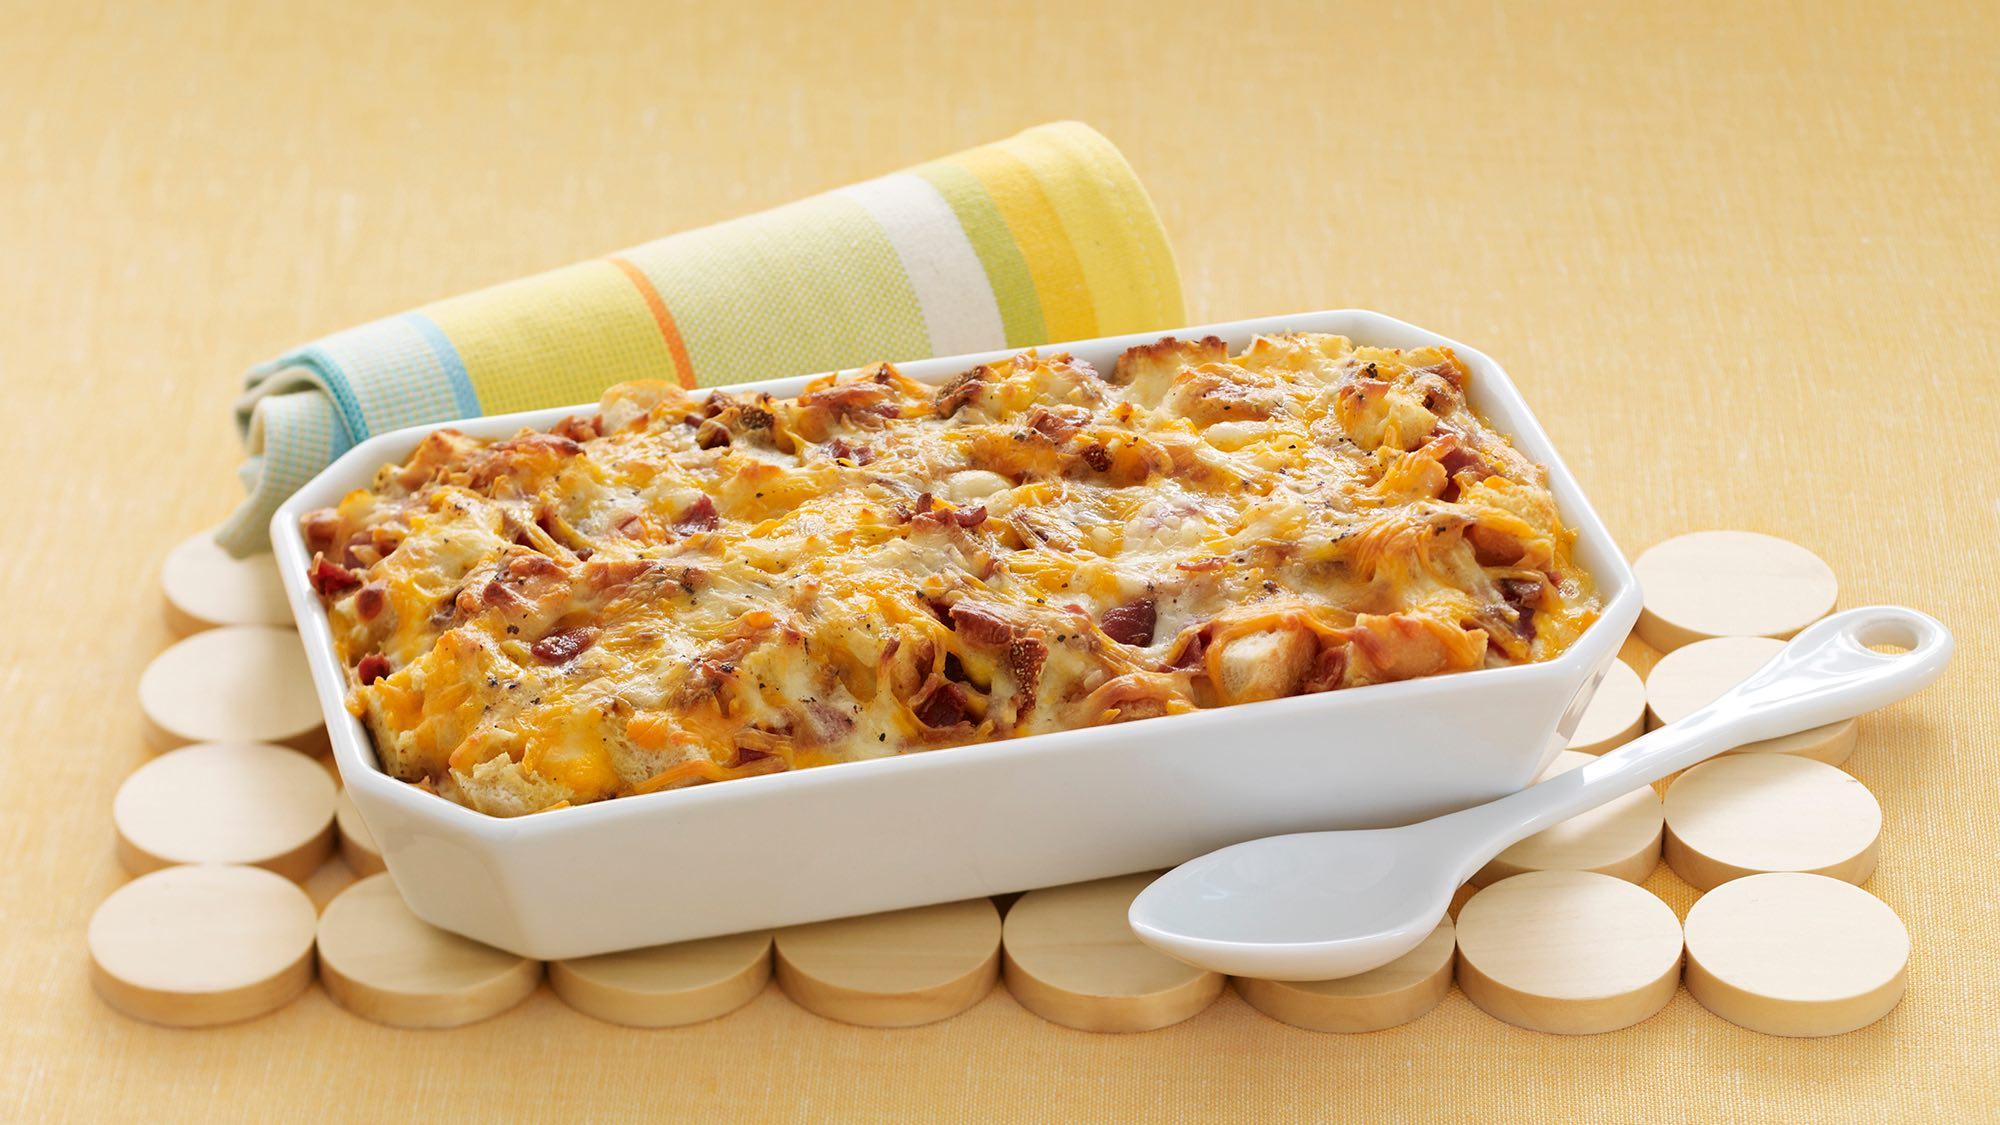 cheesy-bacon-and-egg-brunch-casserole.jpg